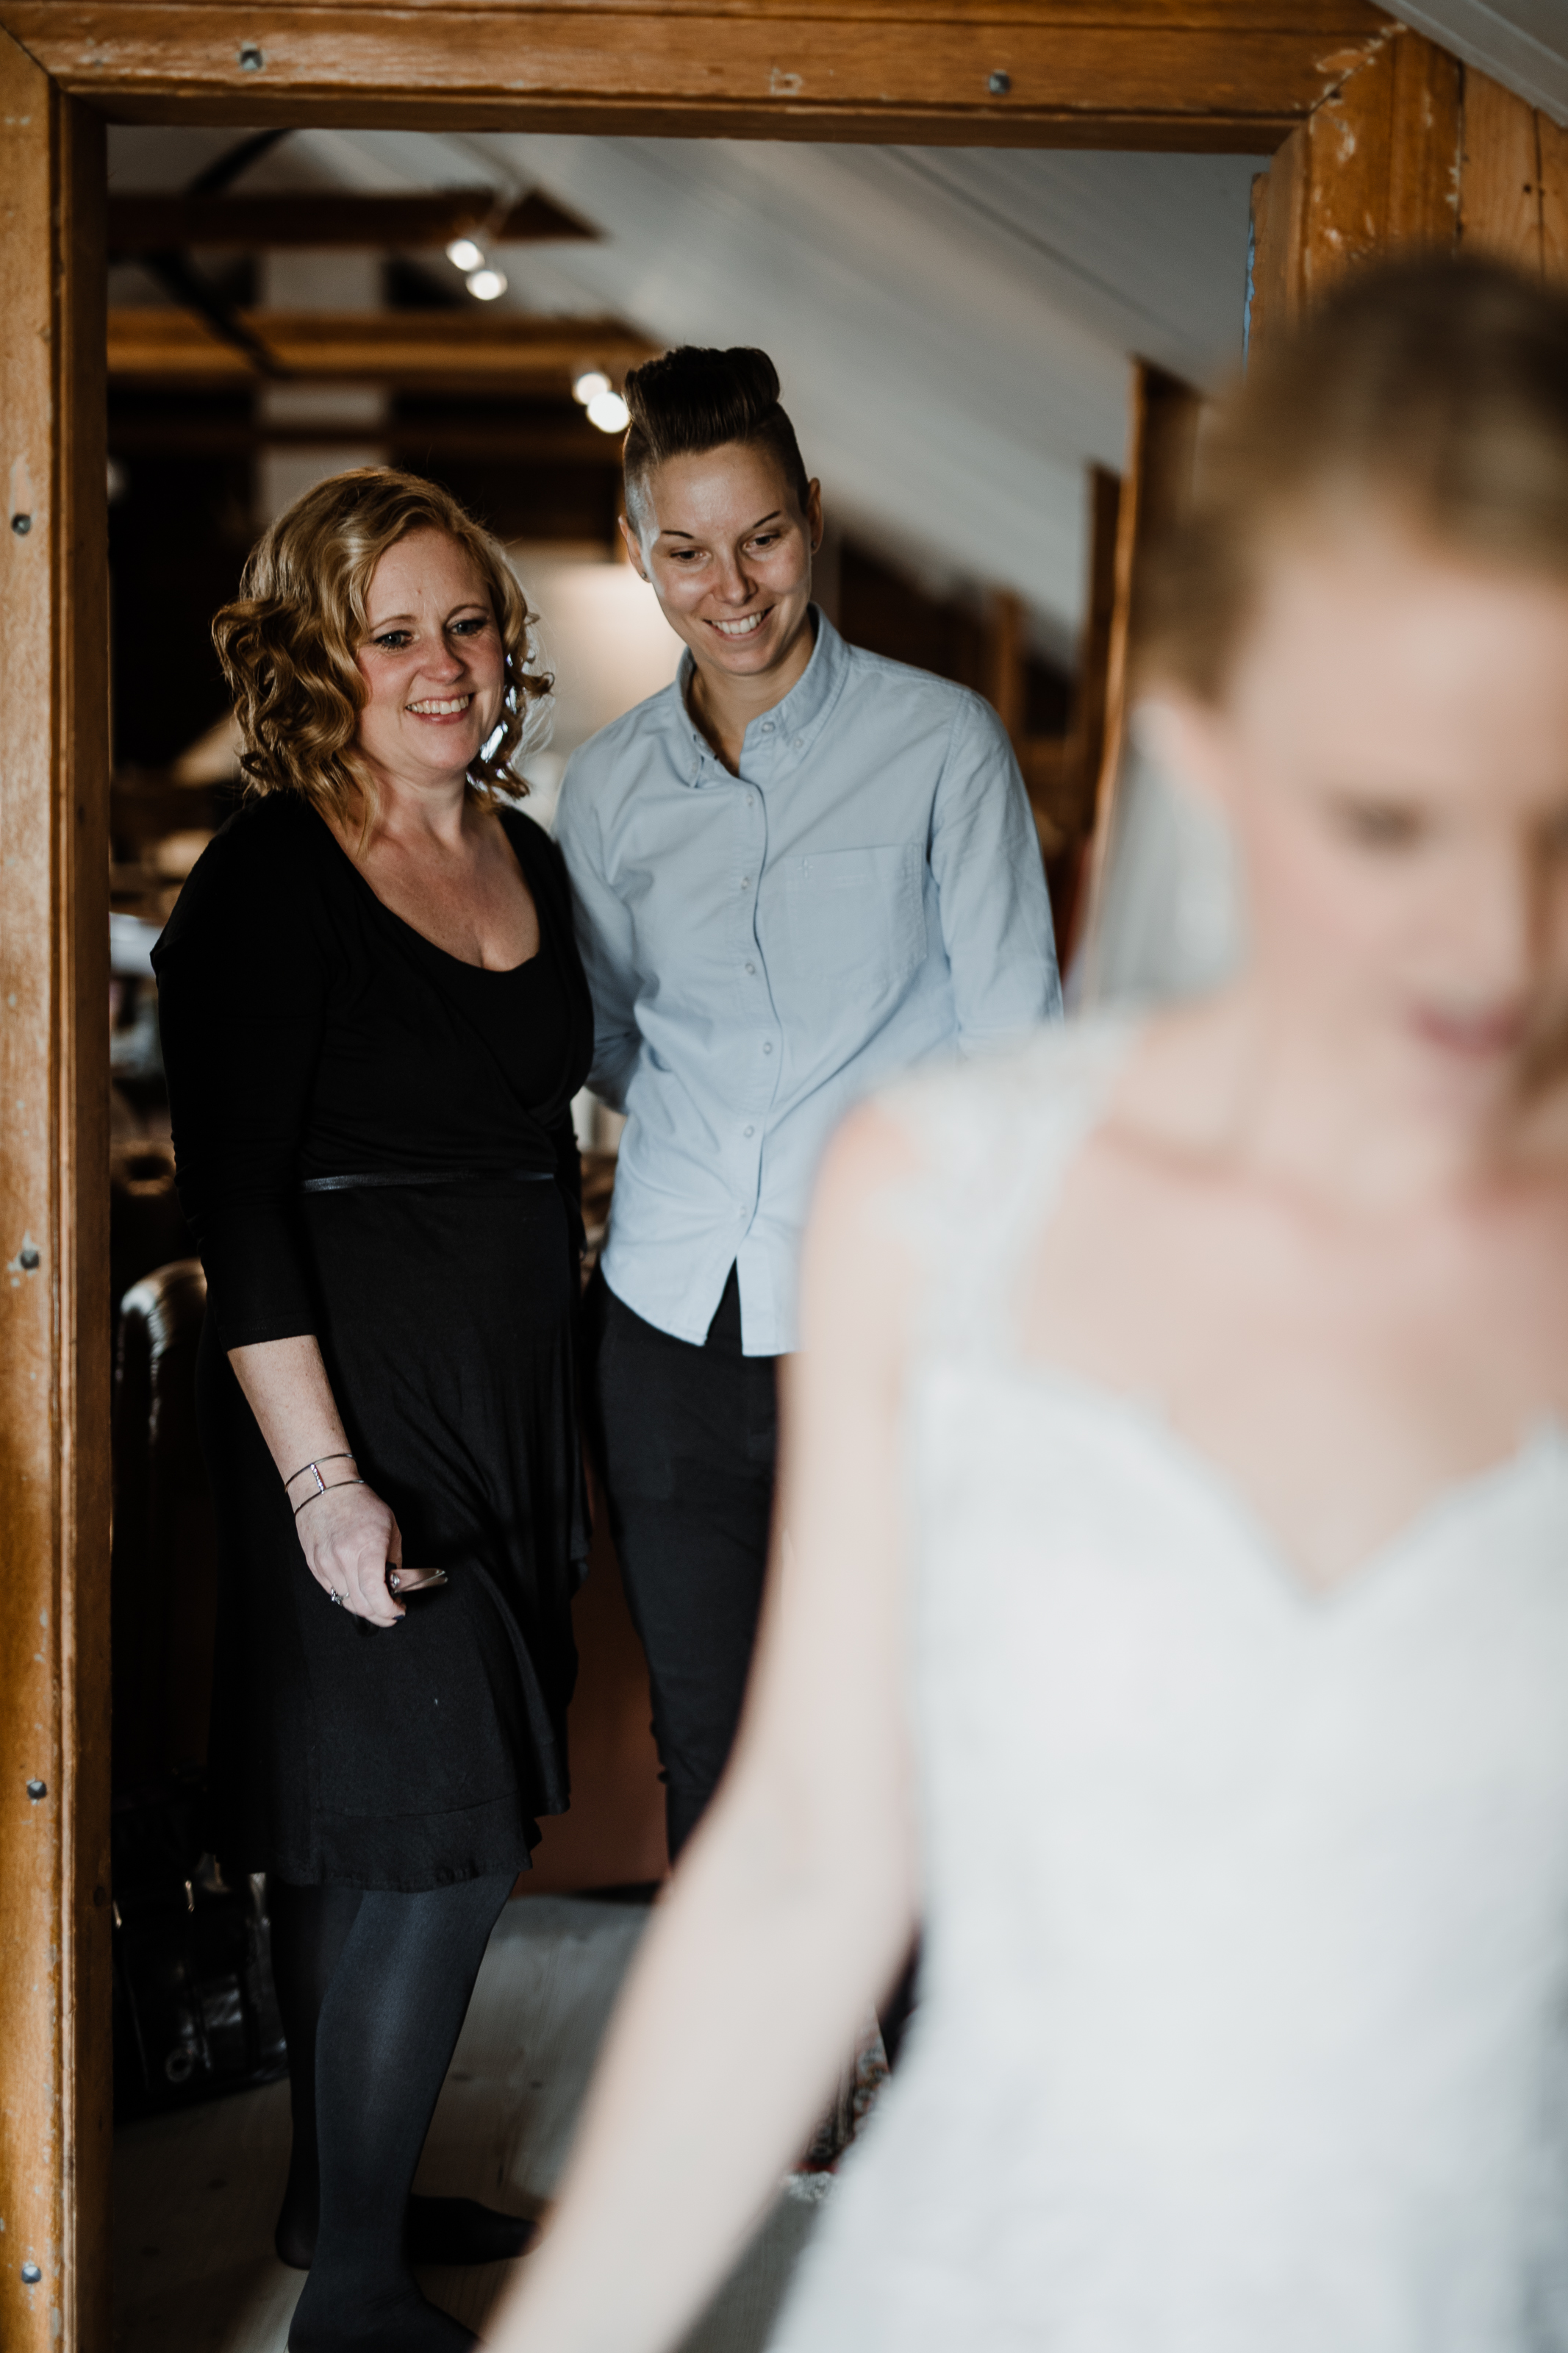 Bröllopsfotograf-Uddetorp Säteri-Höstbröllop-Fotograf Emilia- Bröllopsfotograf Borås-8.jpg